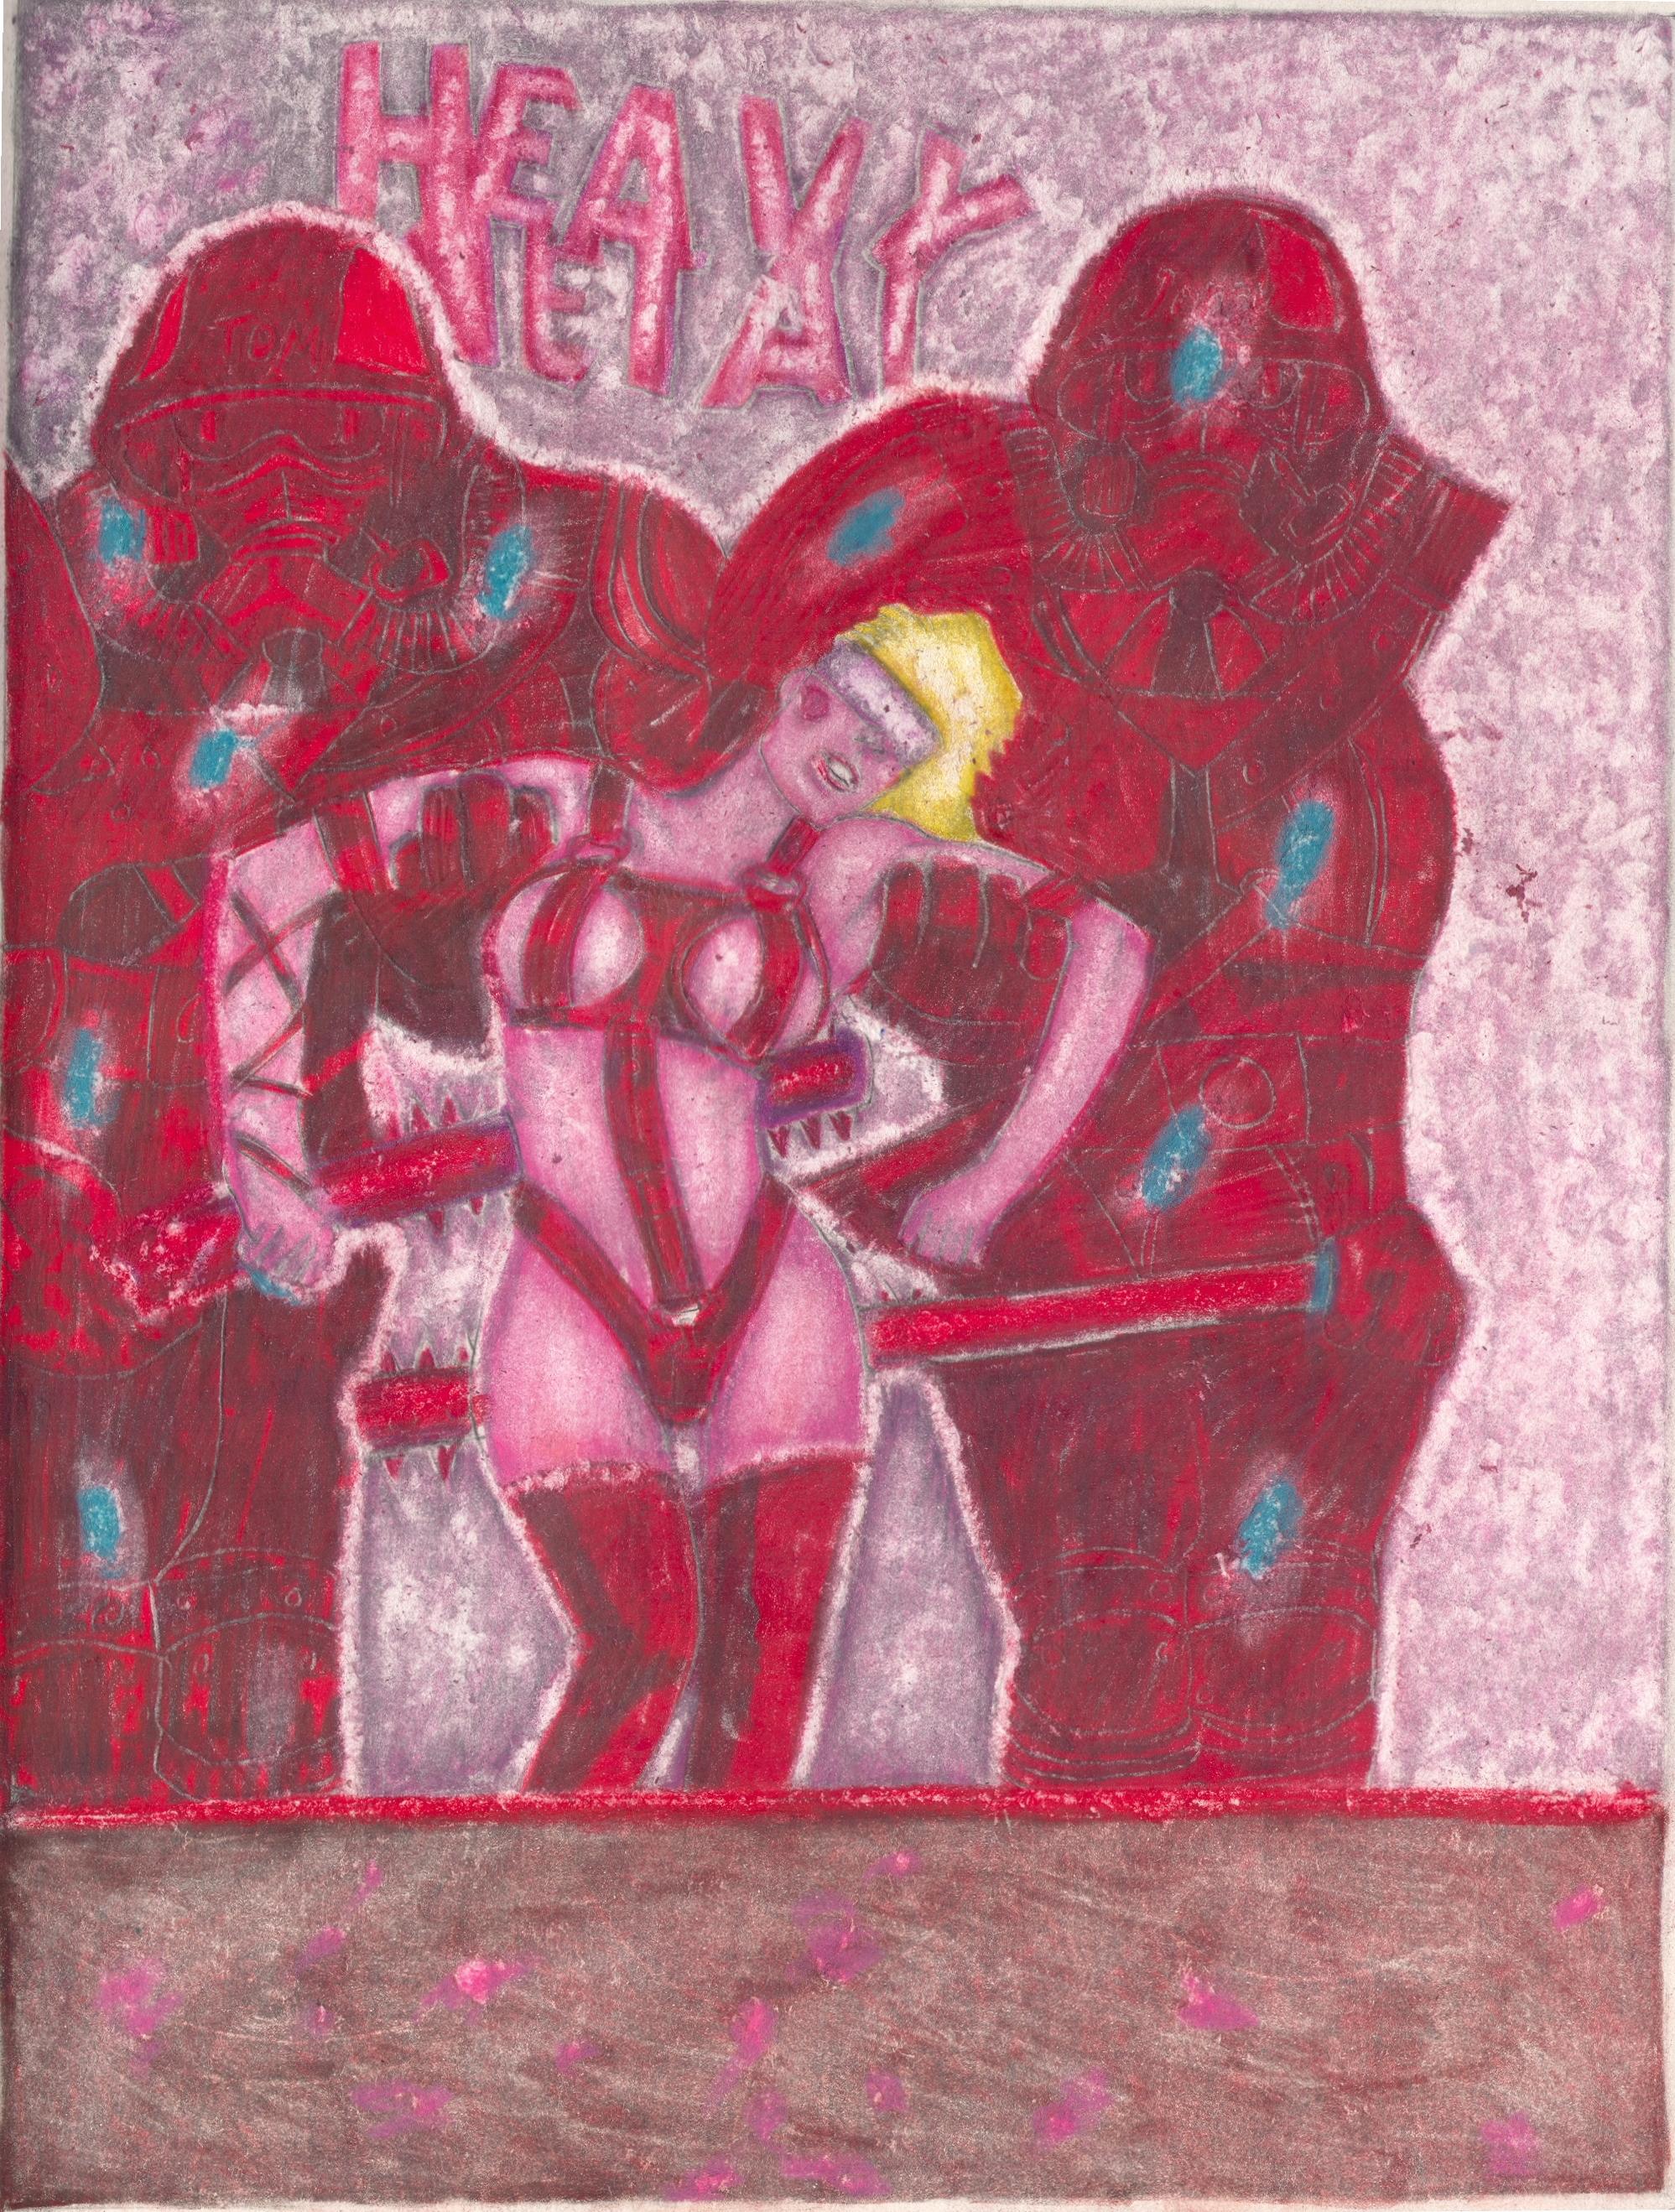 O.T. ( Fantasy Heavy Metall Cover ), 2019     Buntstift auf Papier, 26x35.5cm